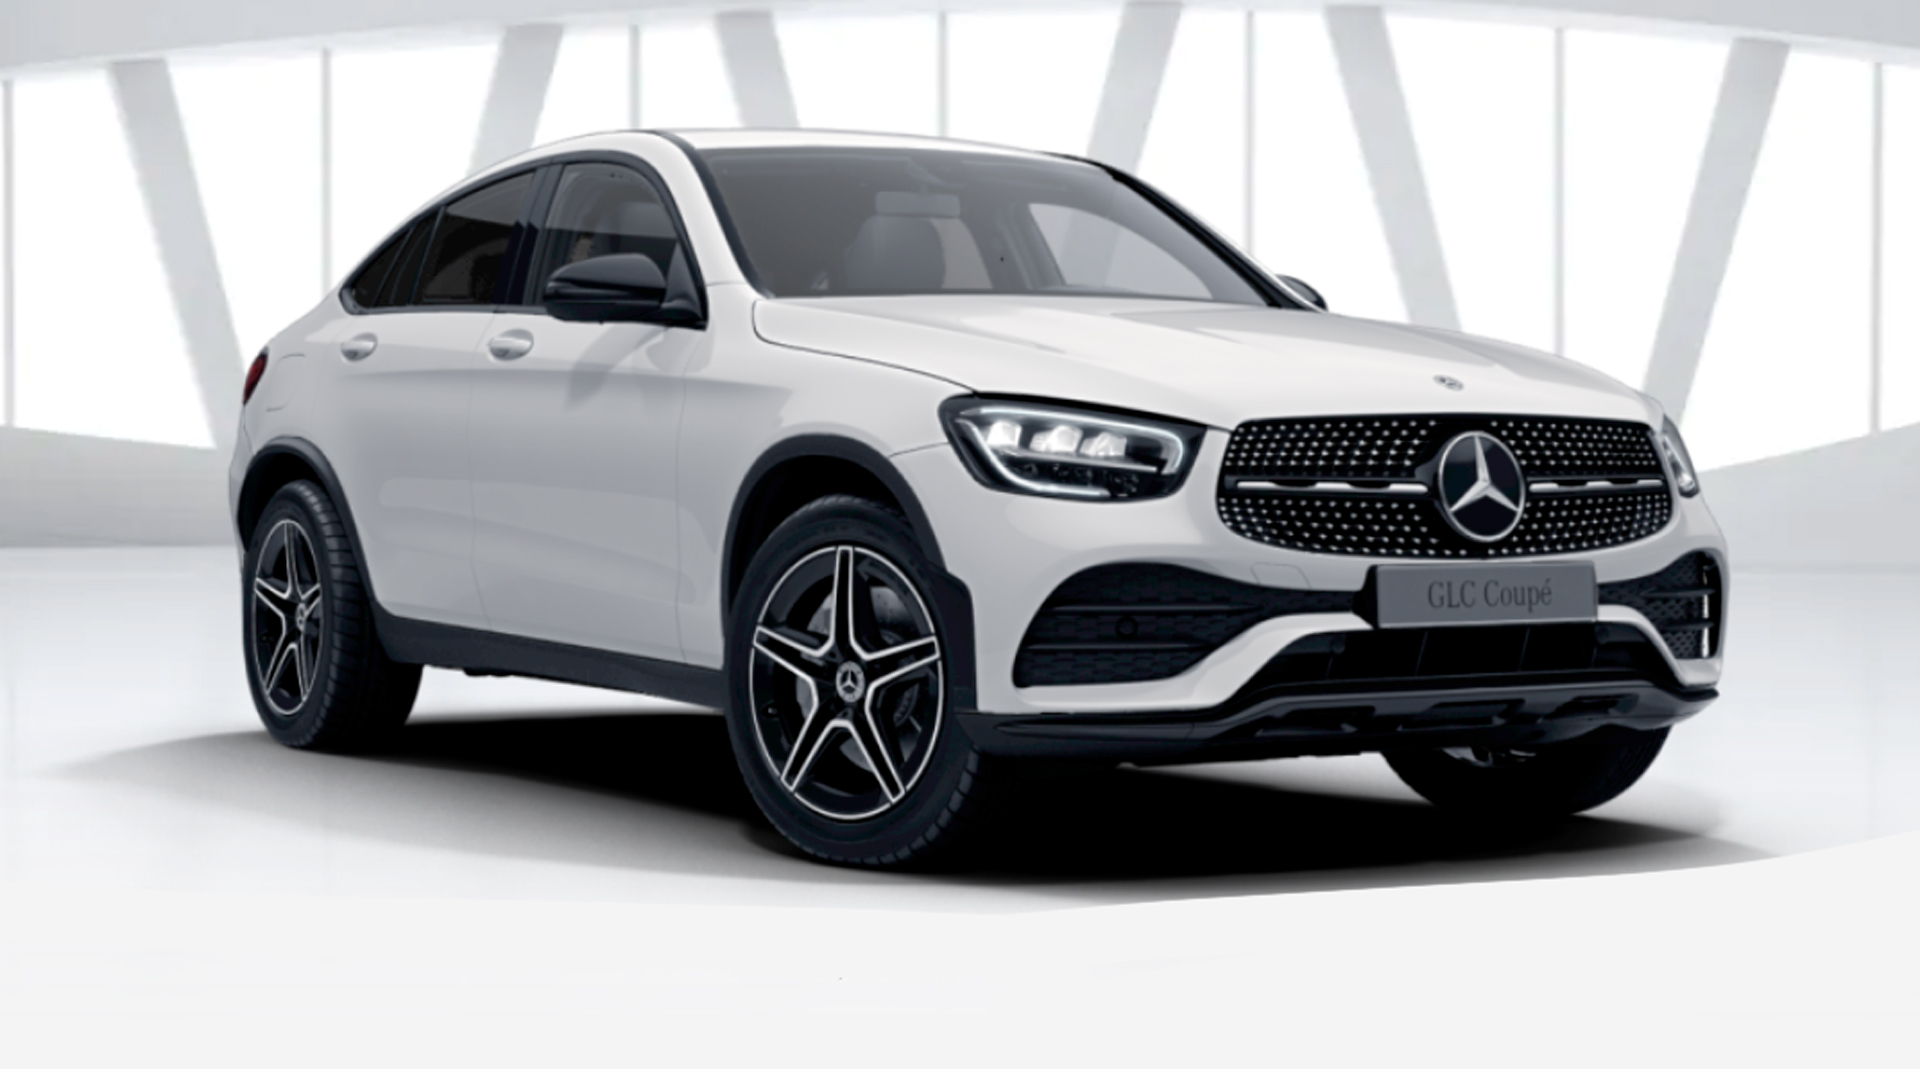 Mercedes-Benz GLC Coupe  0152632093